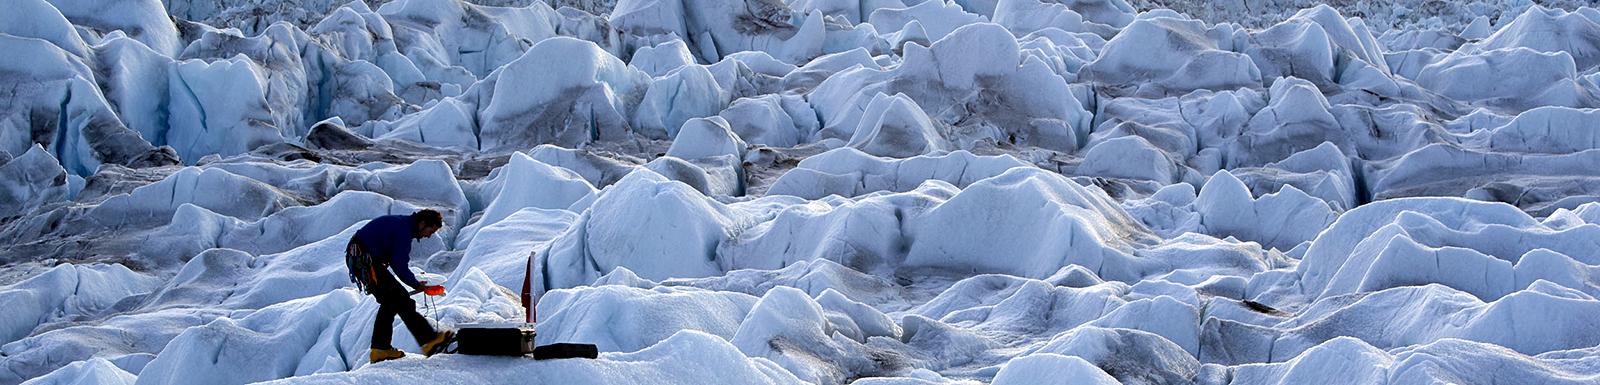 Greenland-2142b